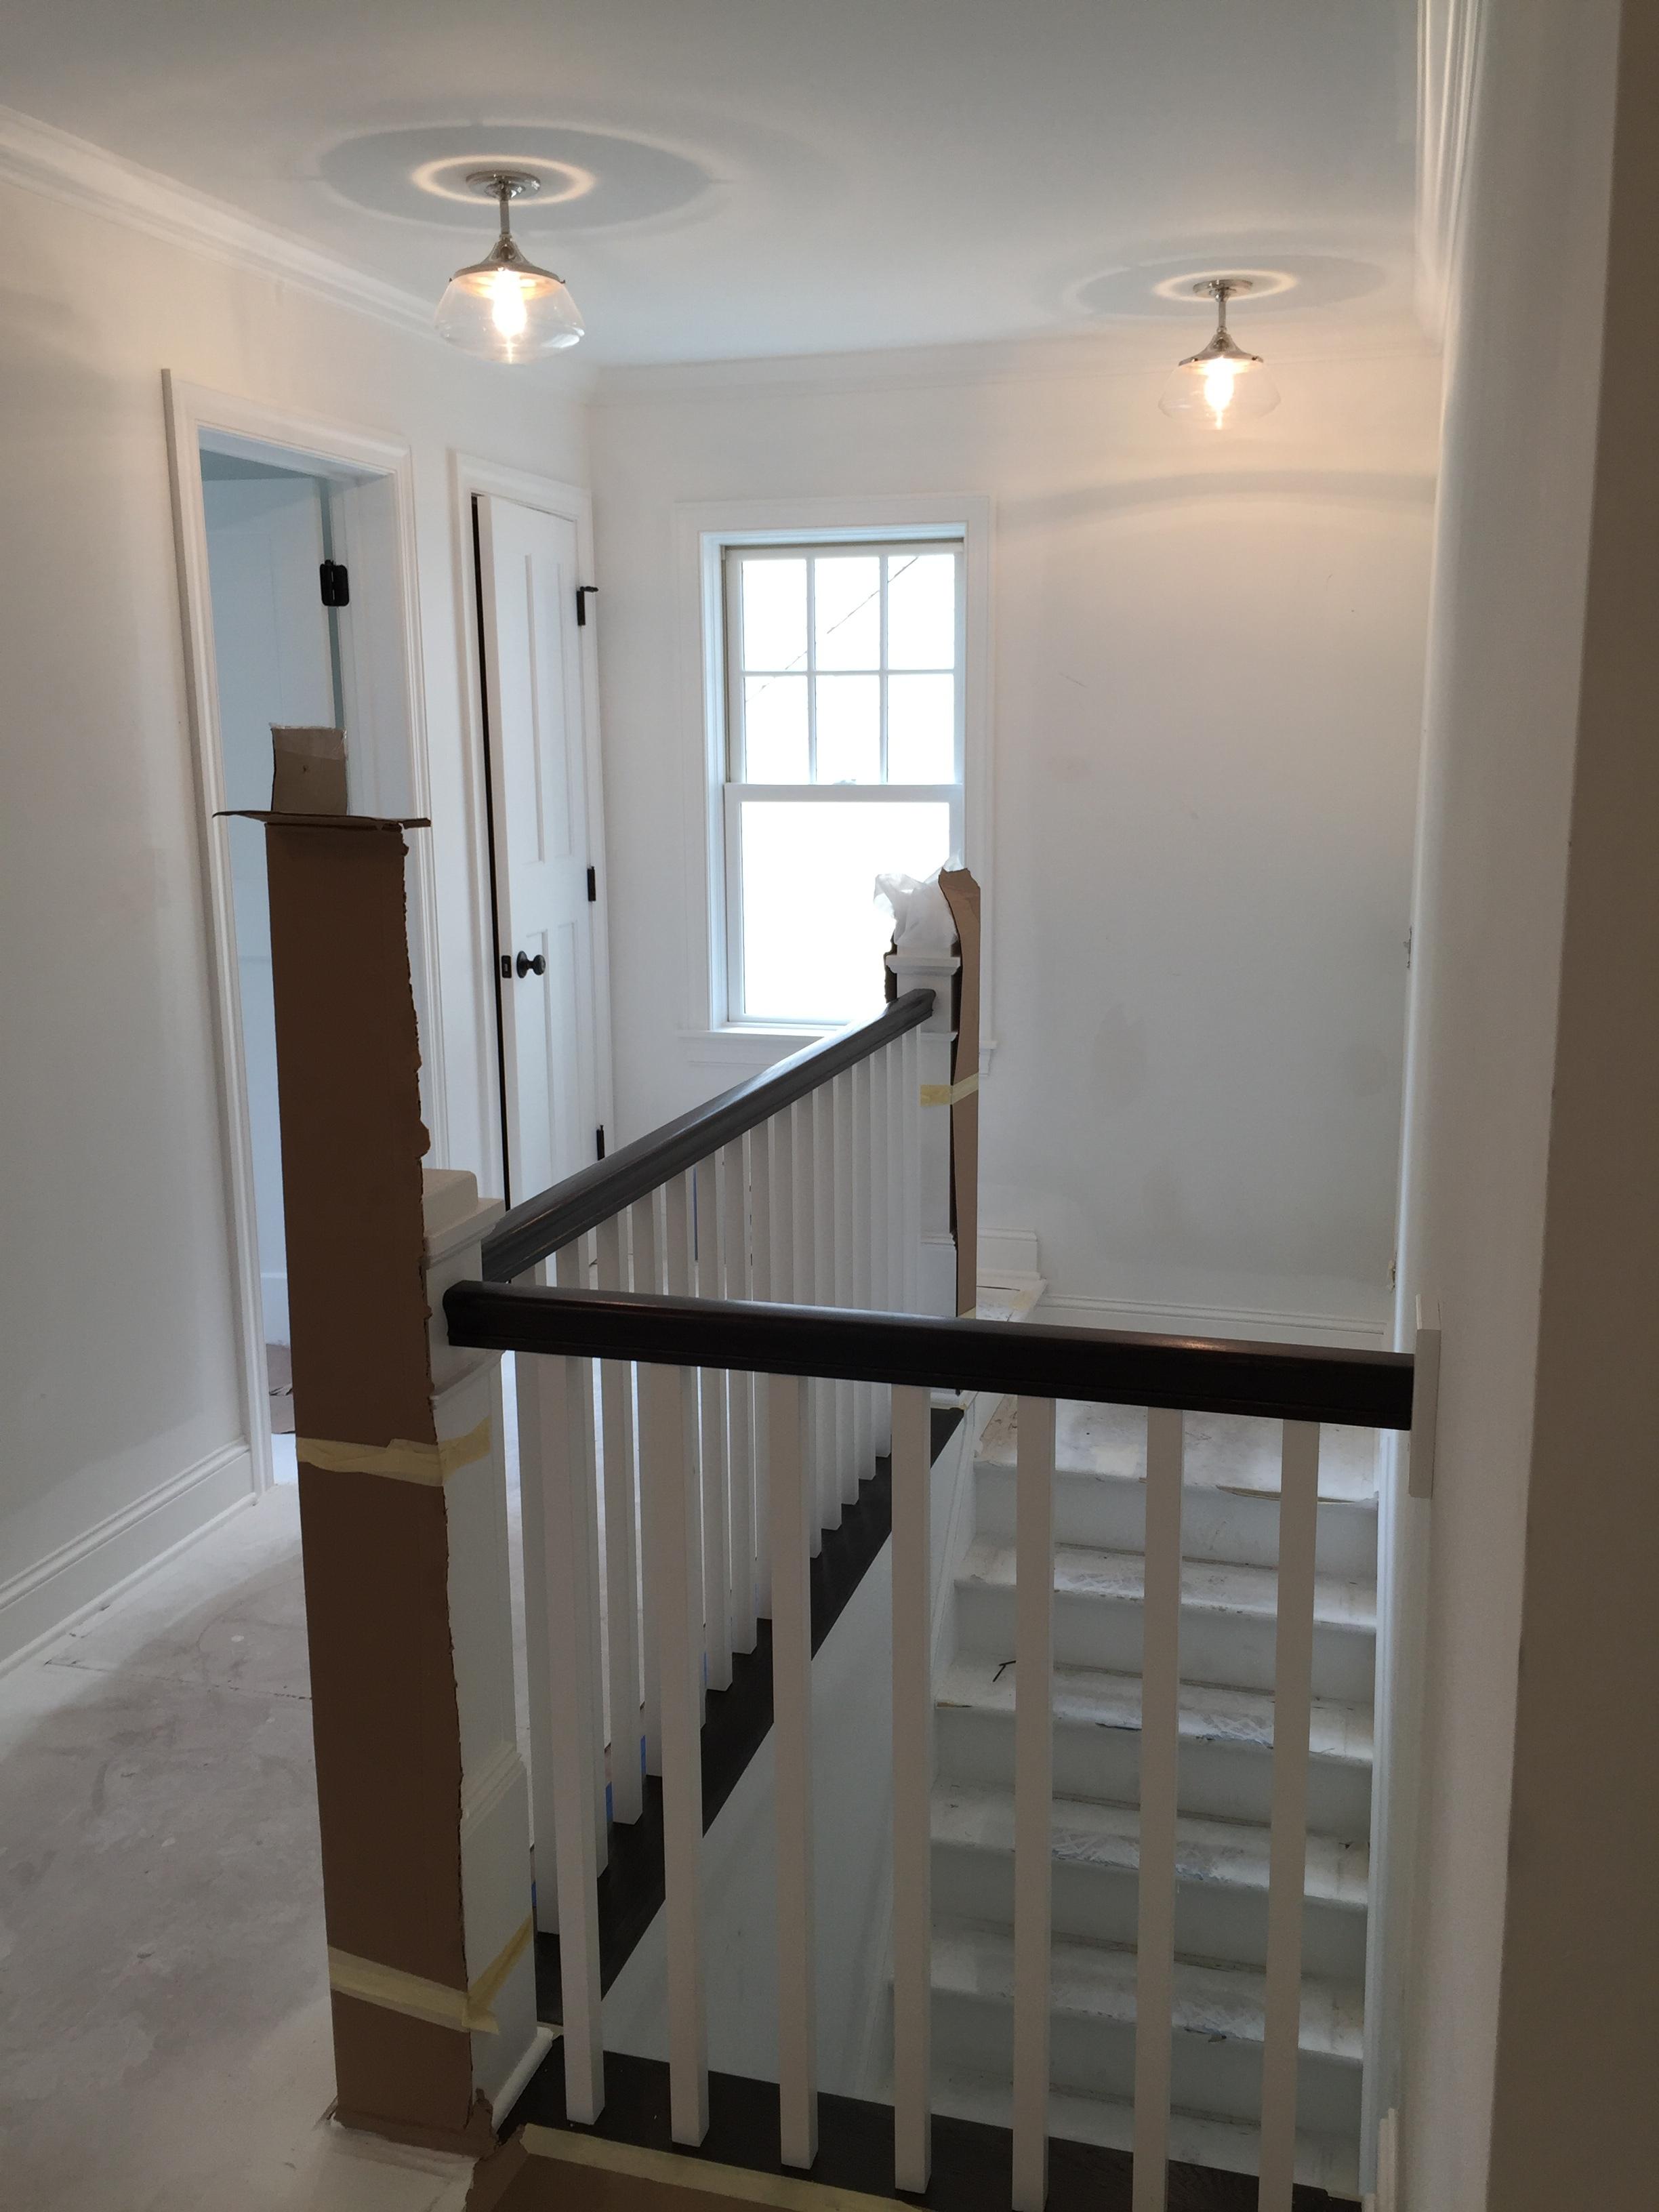 10-railing.JPG